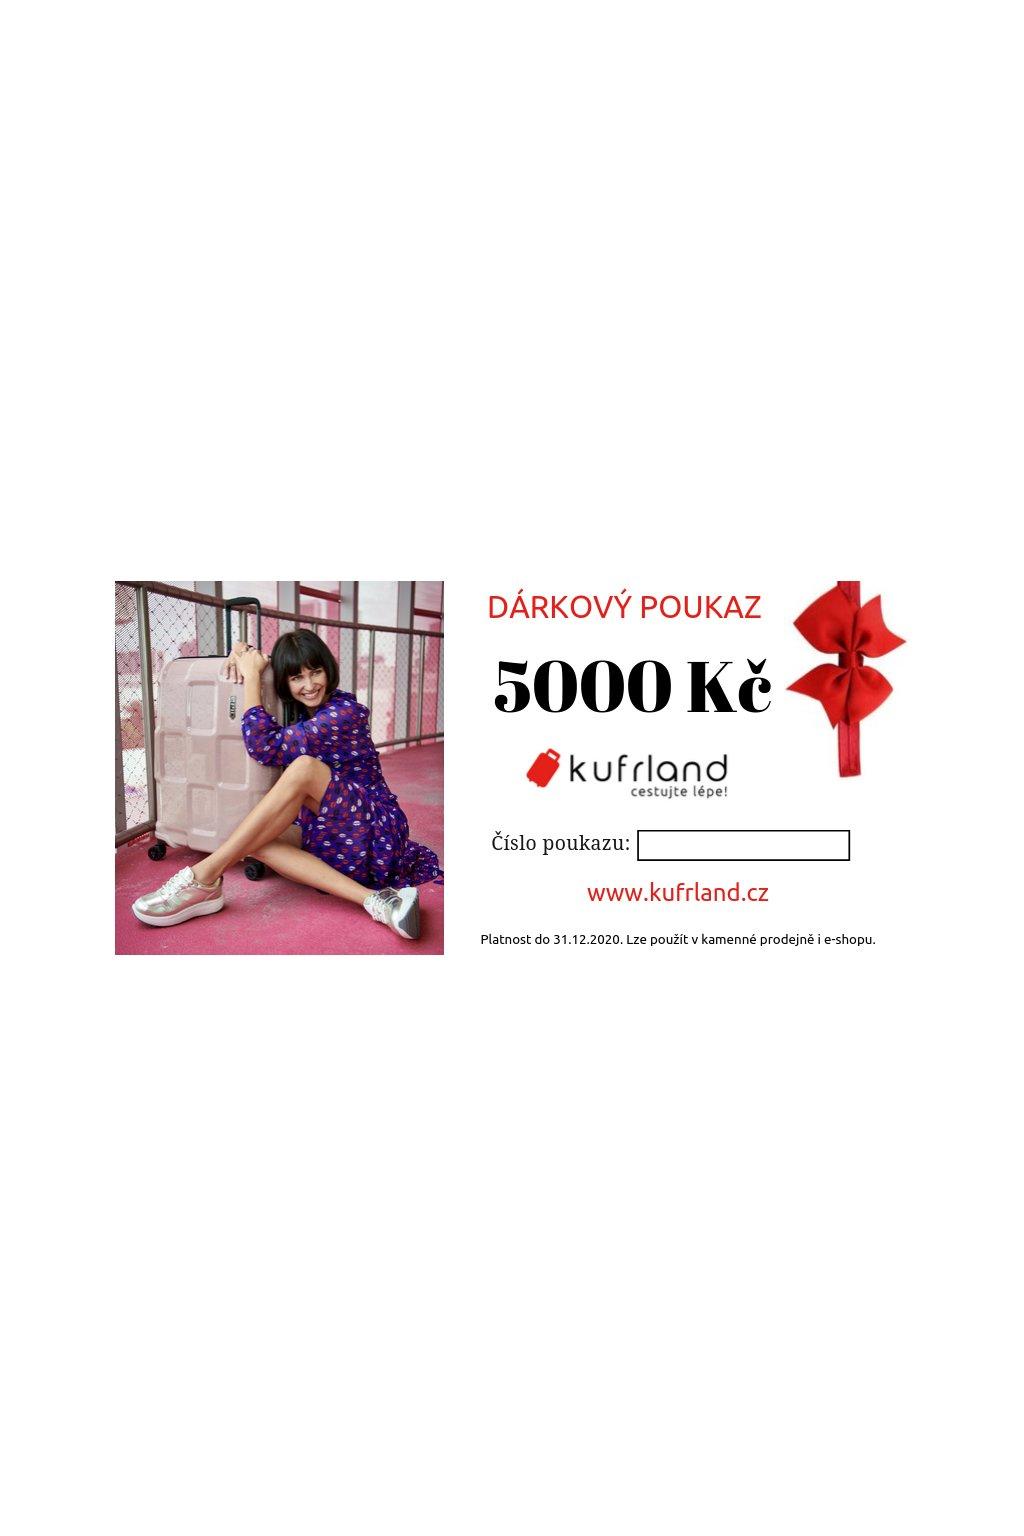 kufrland darkovypoukaz 5000kc